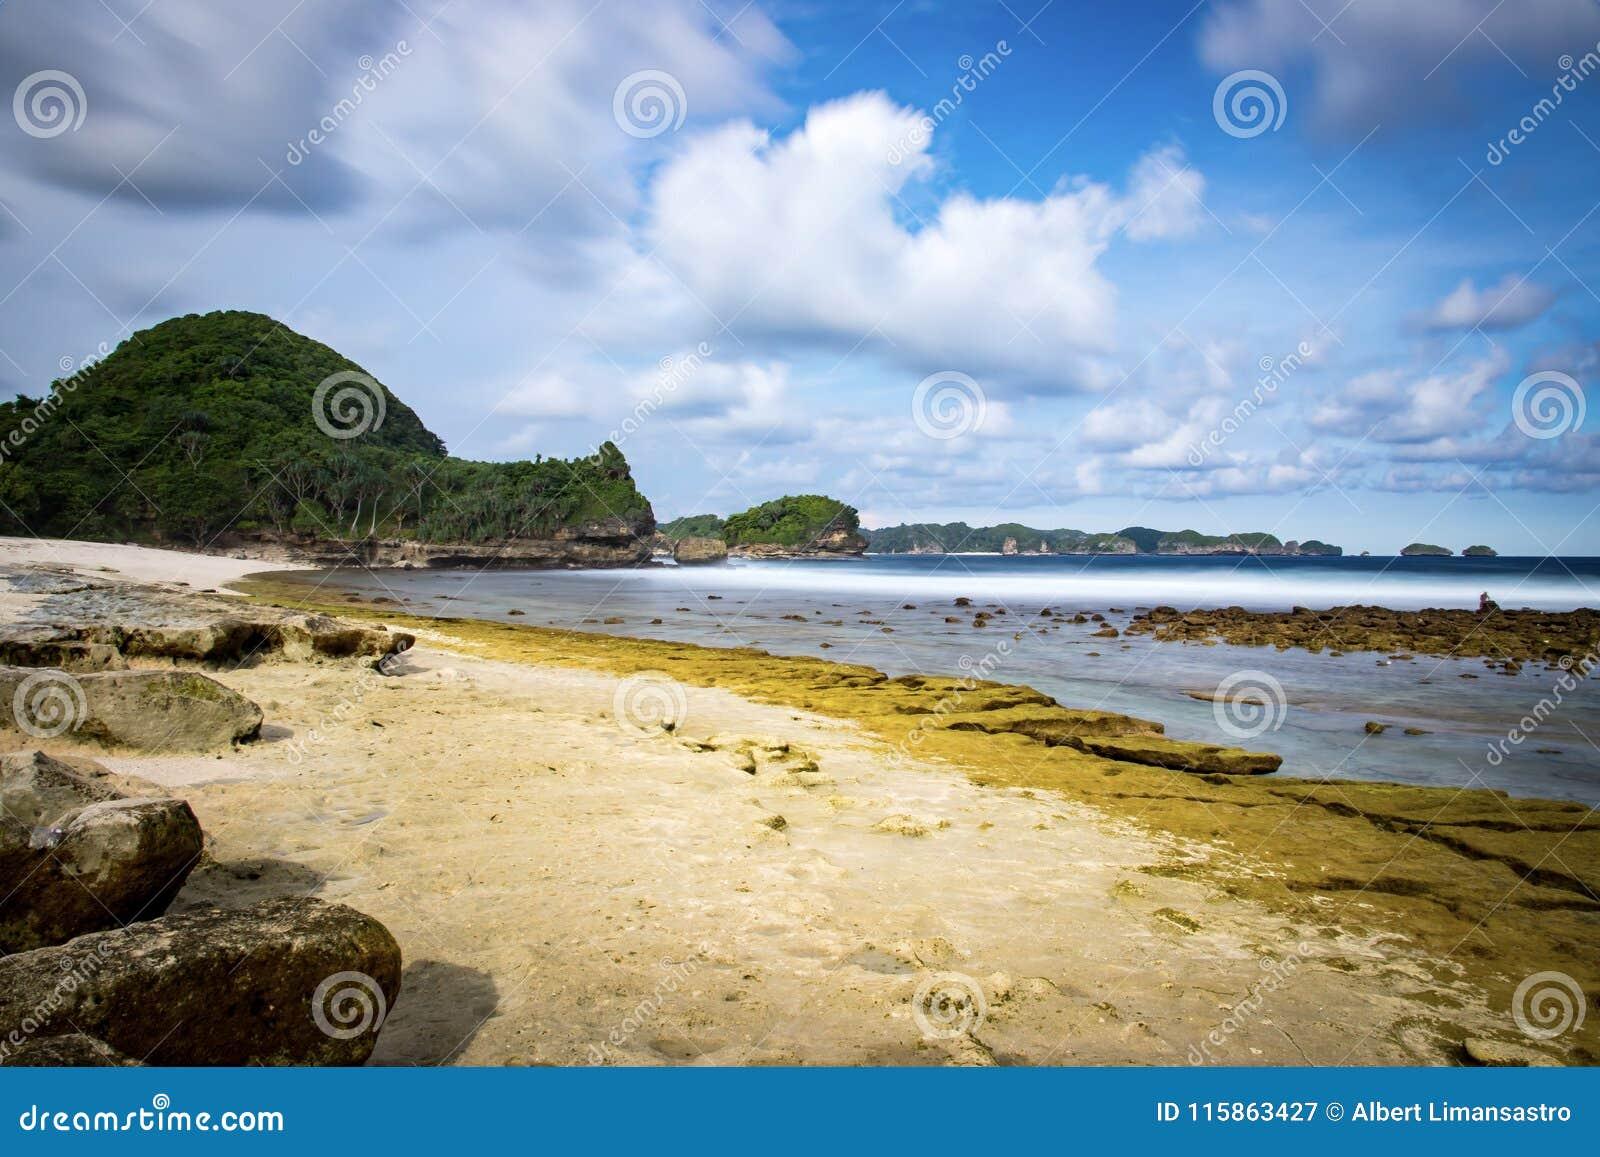 Goa Cina Beach Malang Indonesia Stock Image Image Of Sand Beaches 115863427